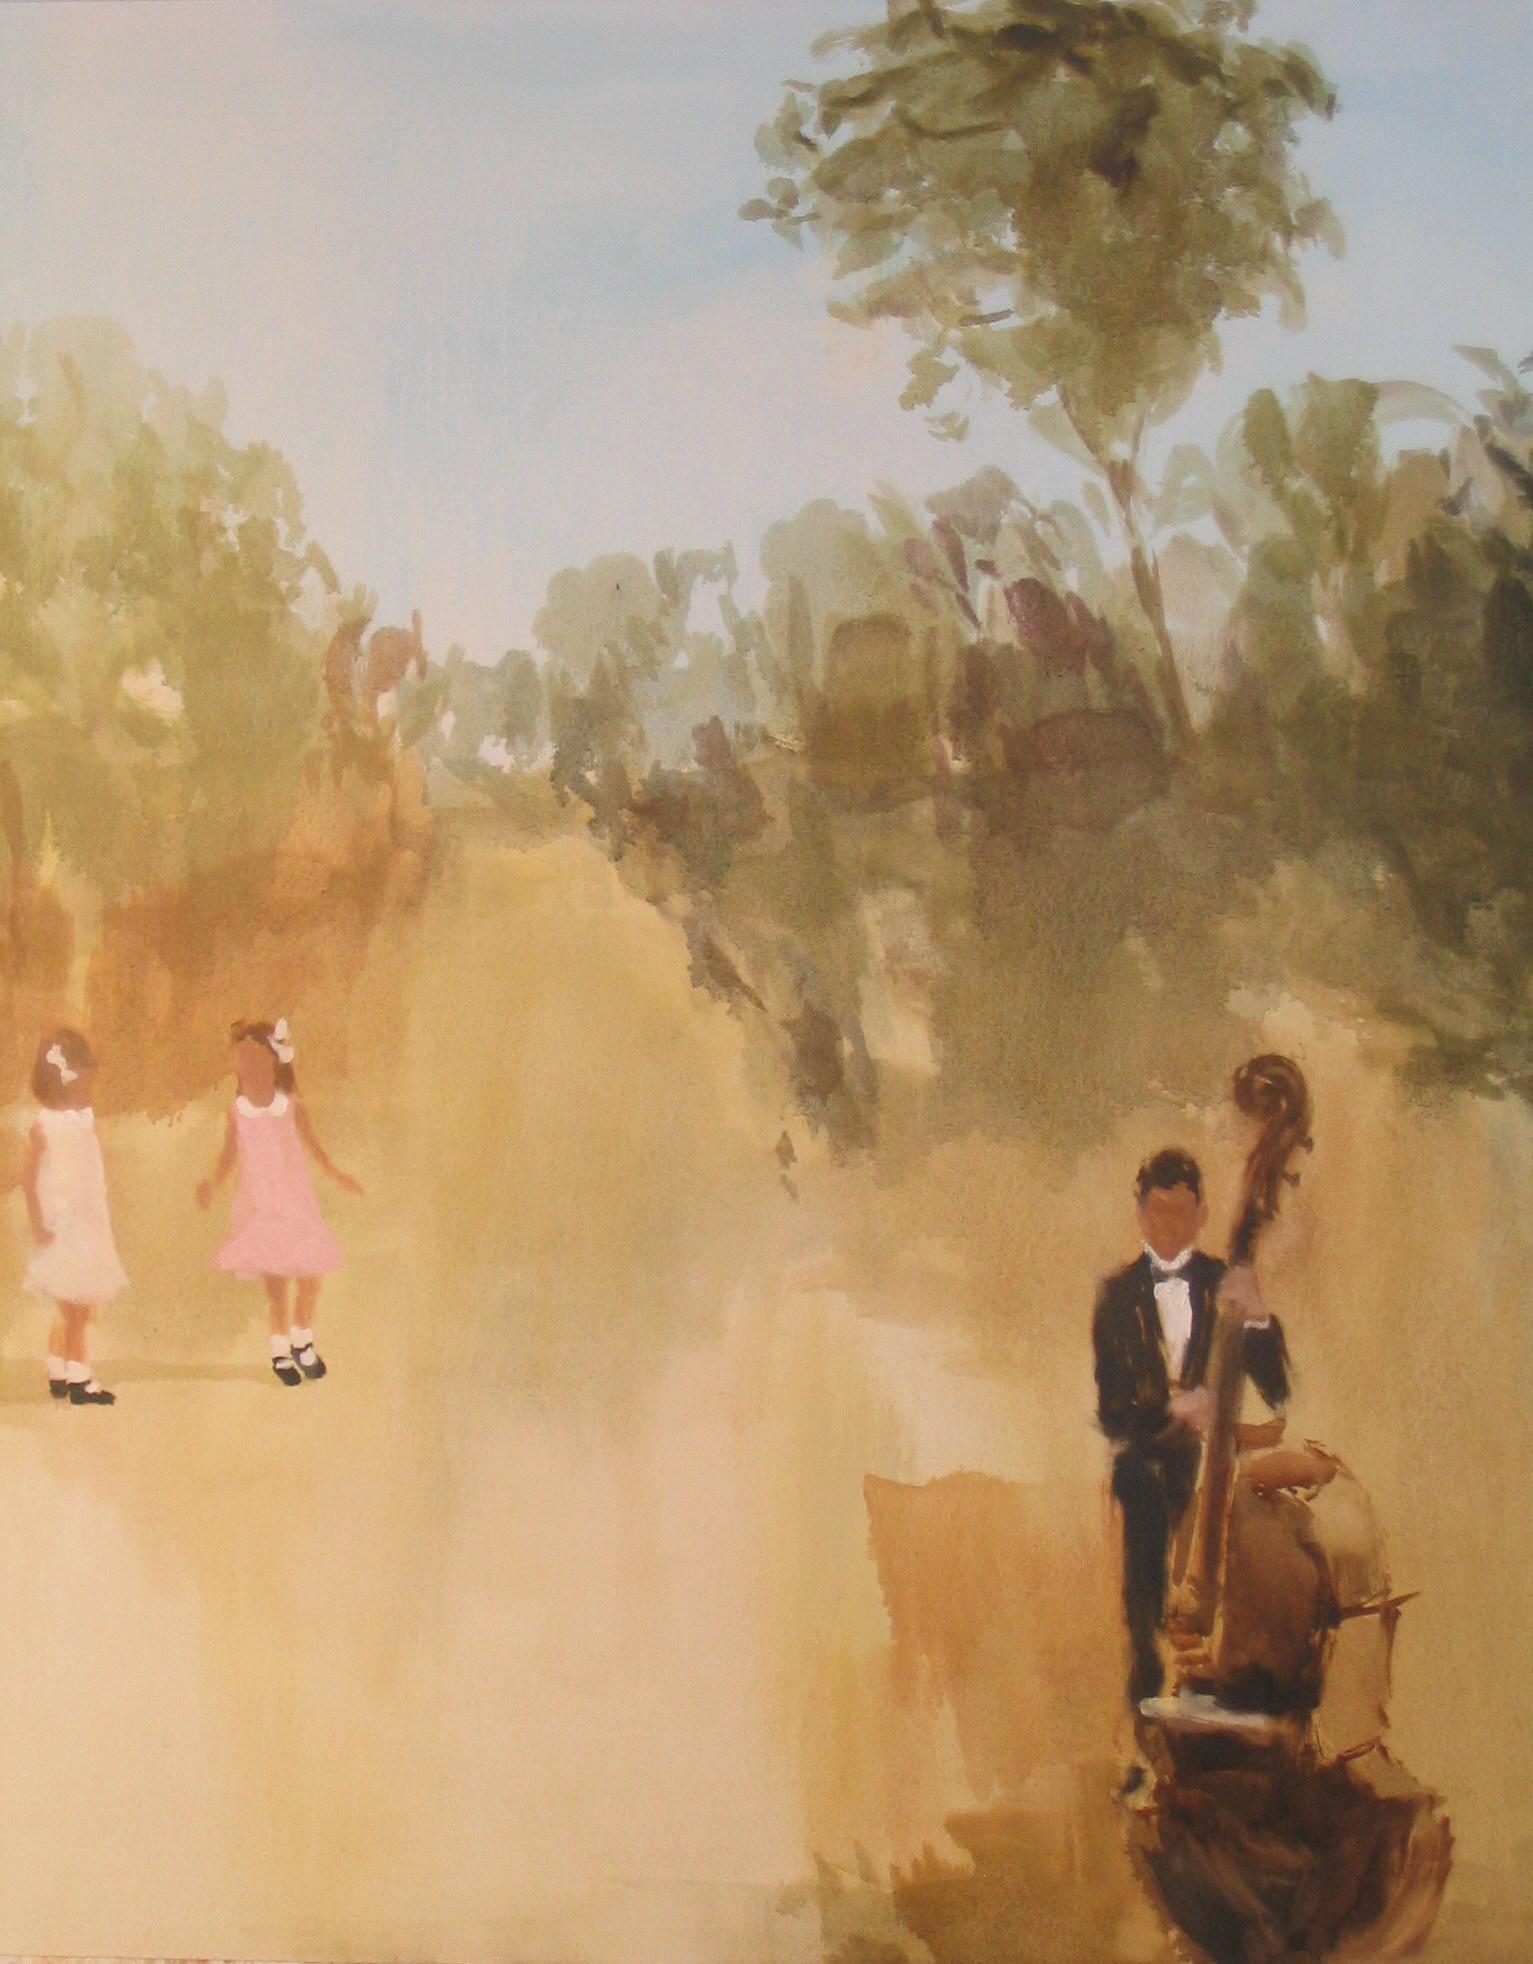 lucky curtain (dance) 42 x 36 in. oil on canvas 2007